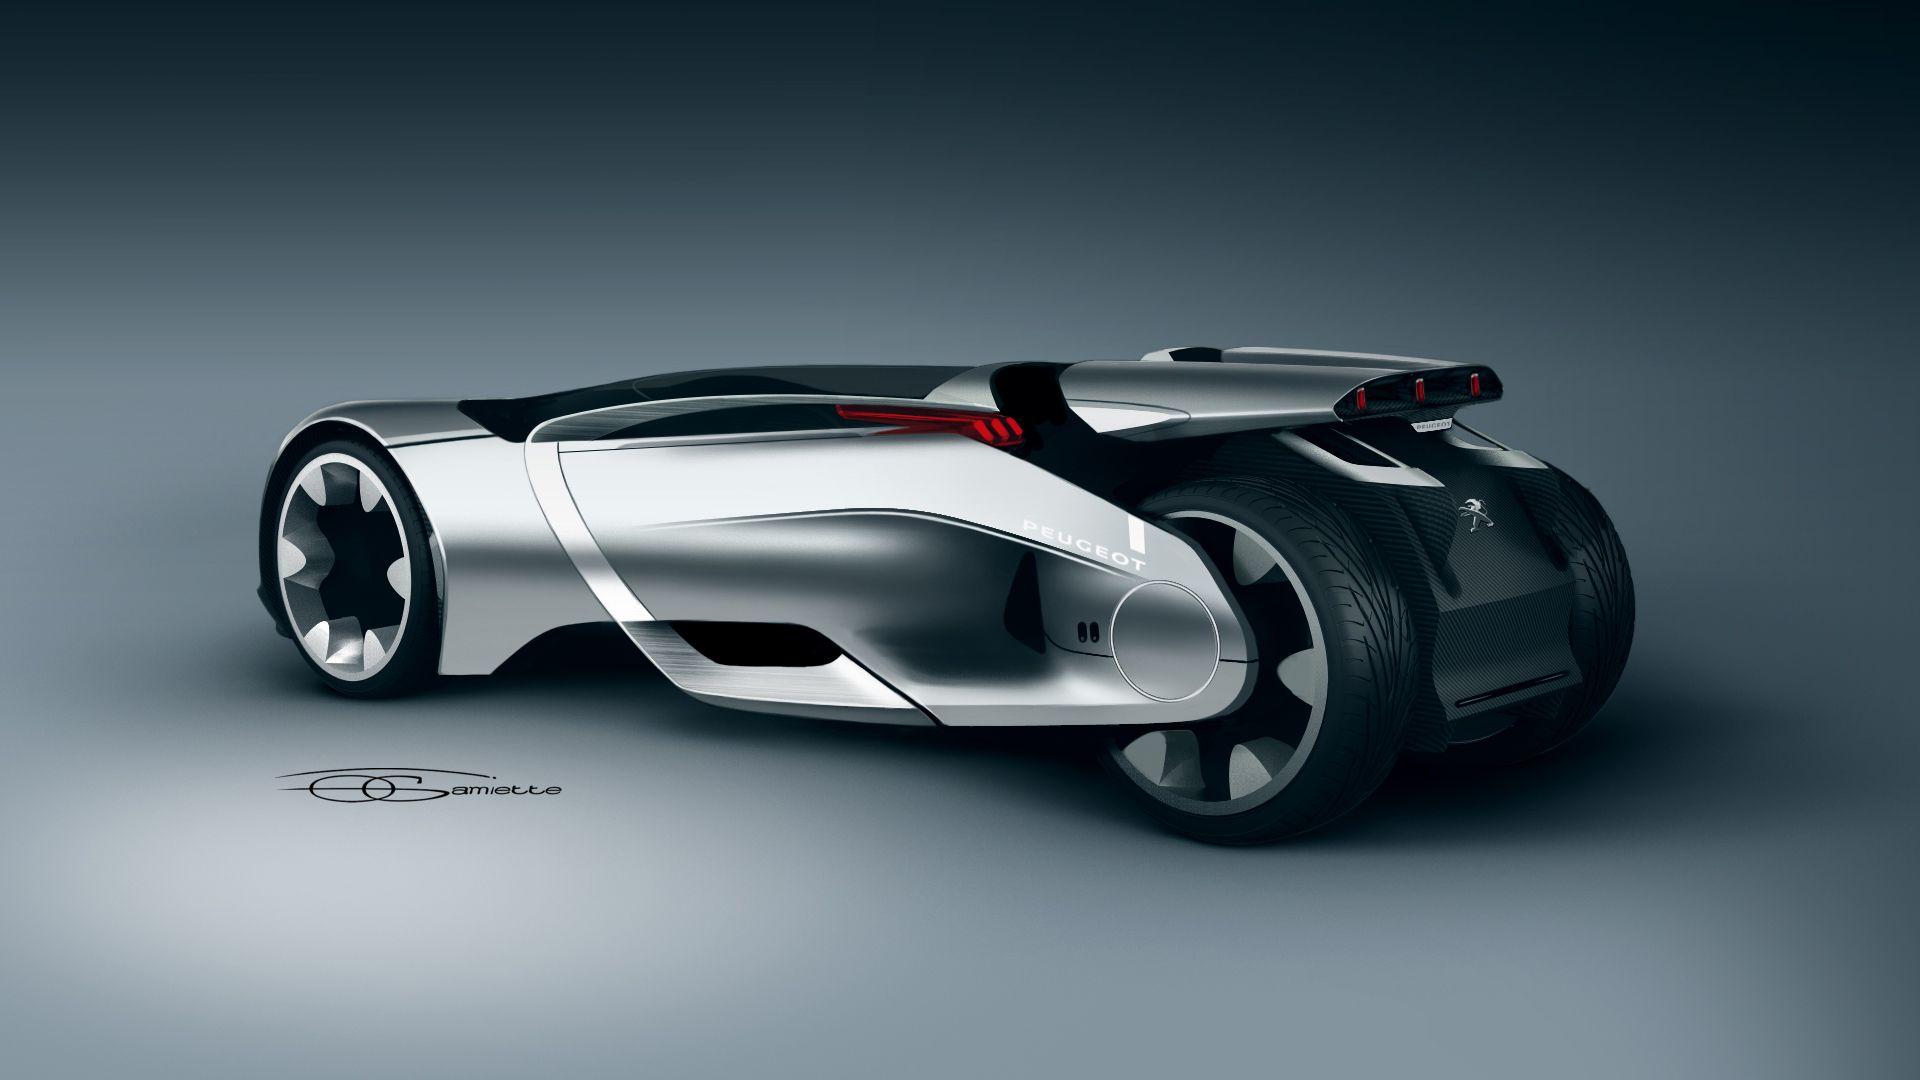 peugeot concept car concept vehicles 39 n 39 sketches concept cars cars peugeot. Black Bedroom Furniture Sets. Home Design Ideas